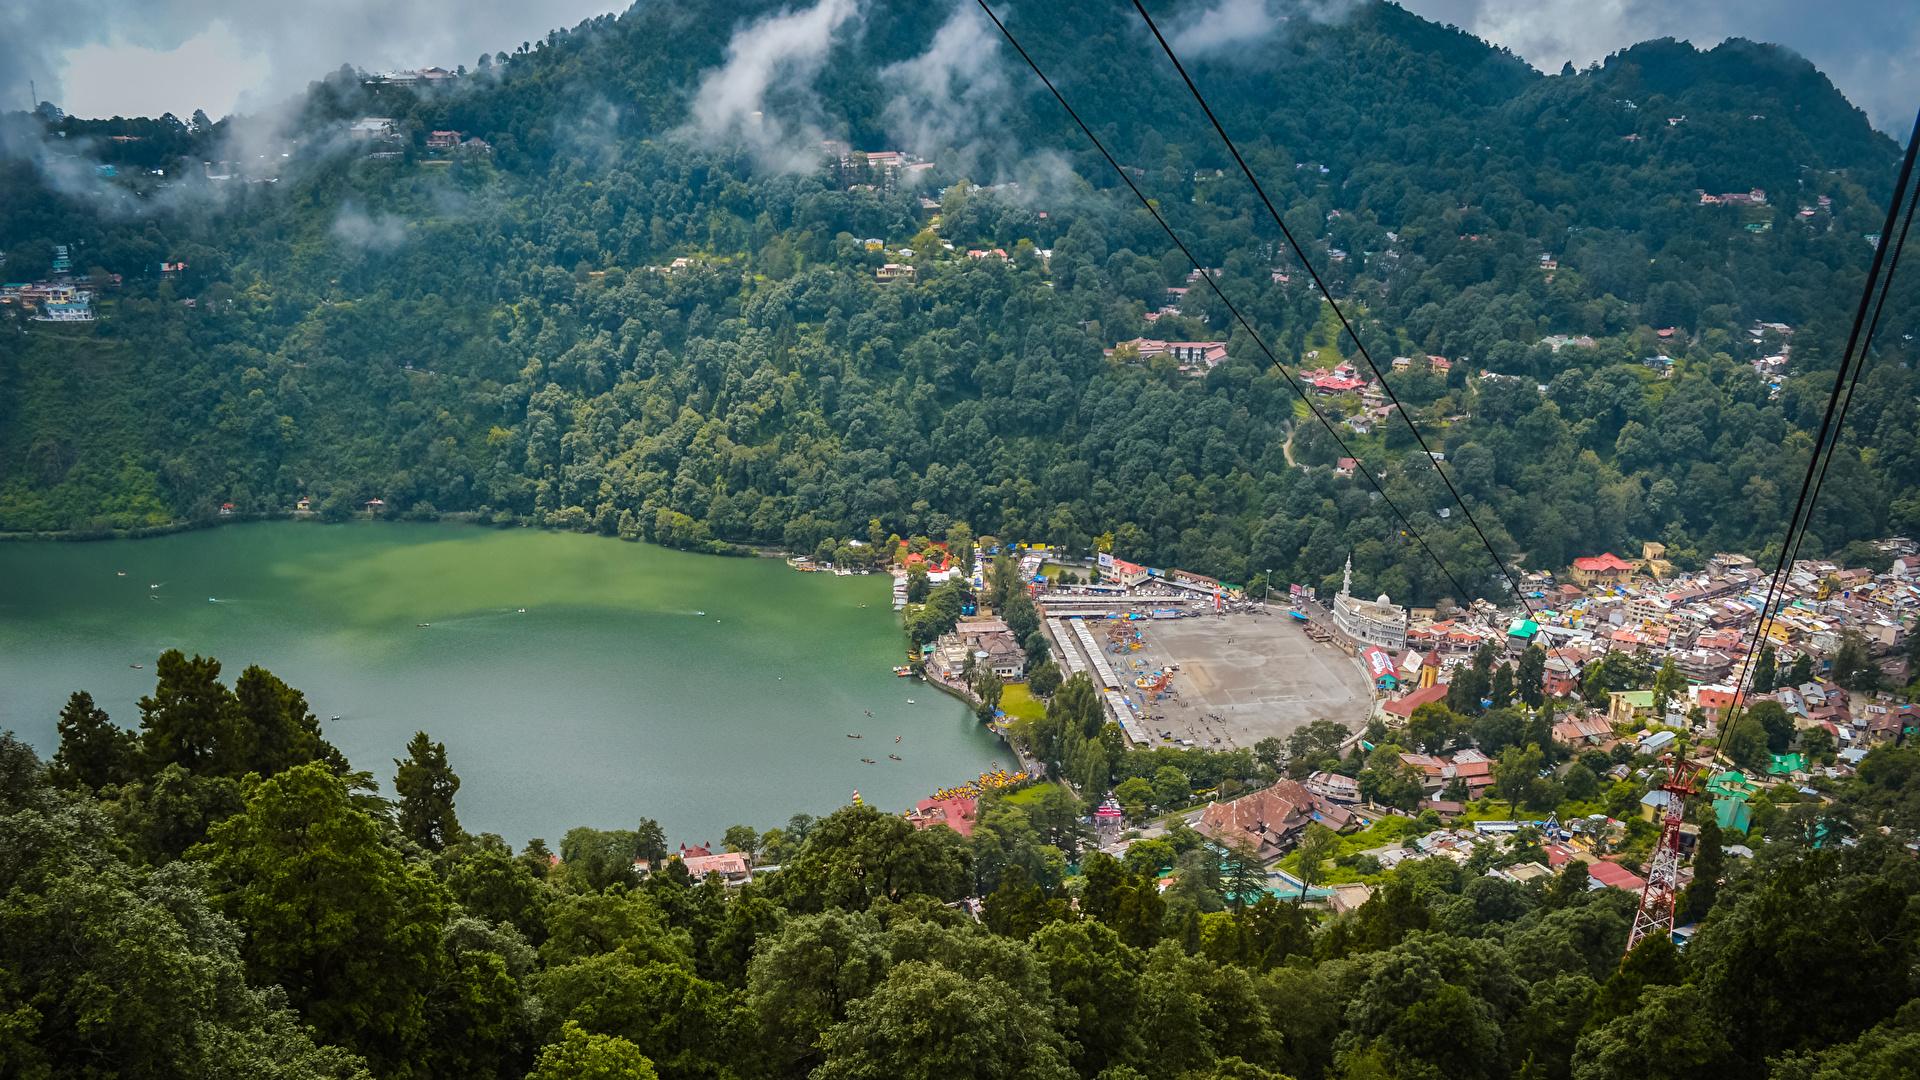 Nainital & lake tour lake, hd wallpapers & backgrounds download.